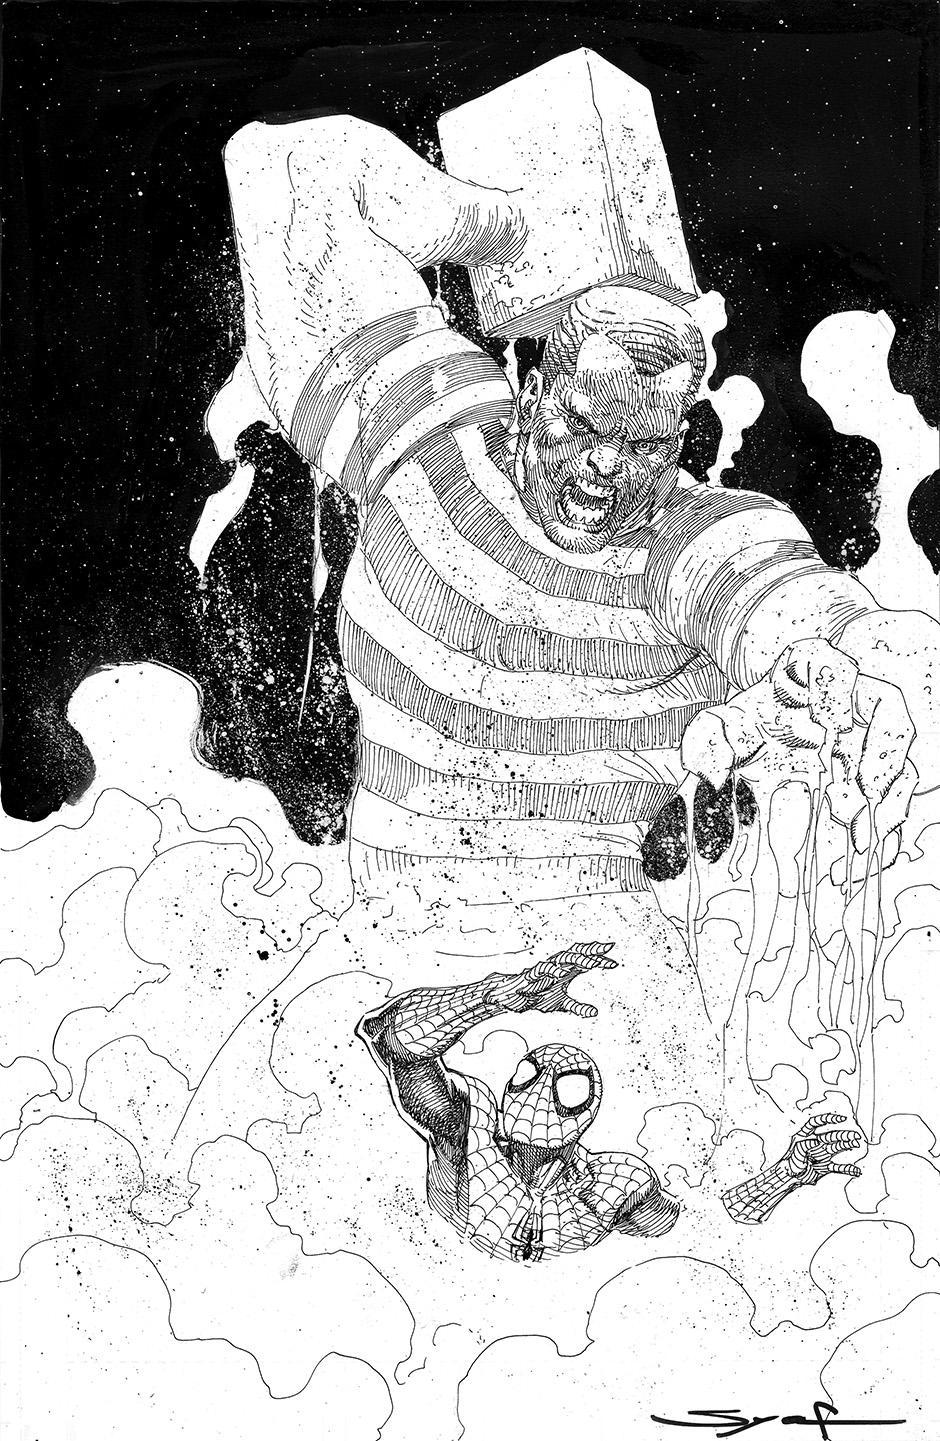 Spider-Man VS Sandman by ardian-syaf